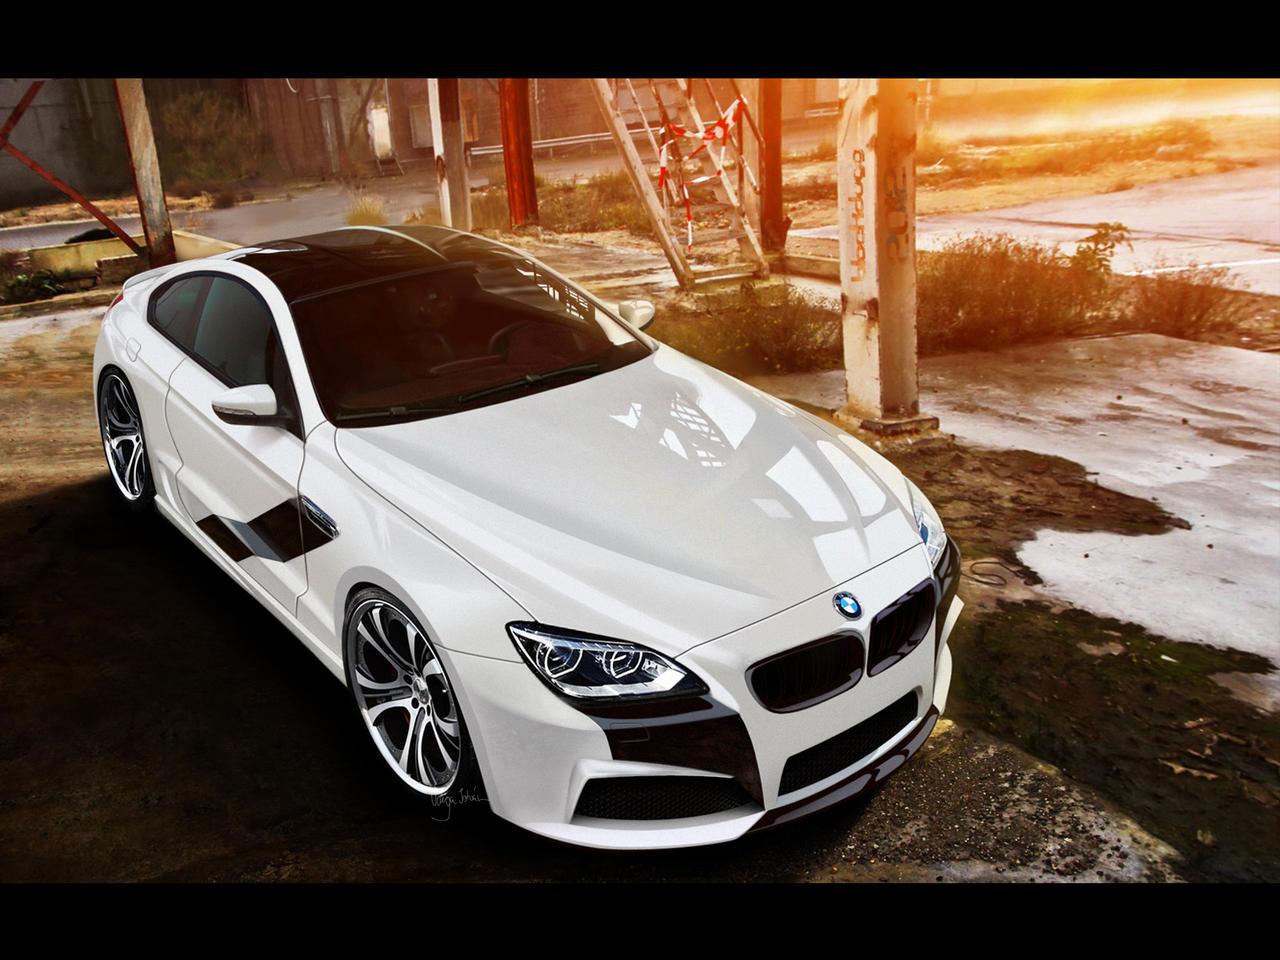 BMW M6 by blackdoggdesign